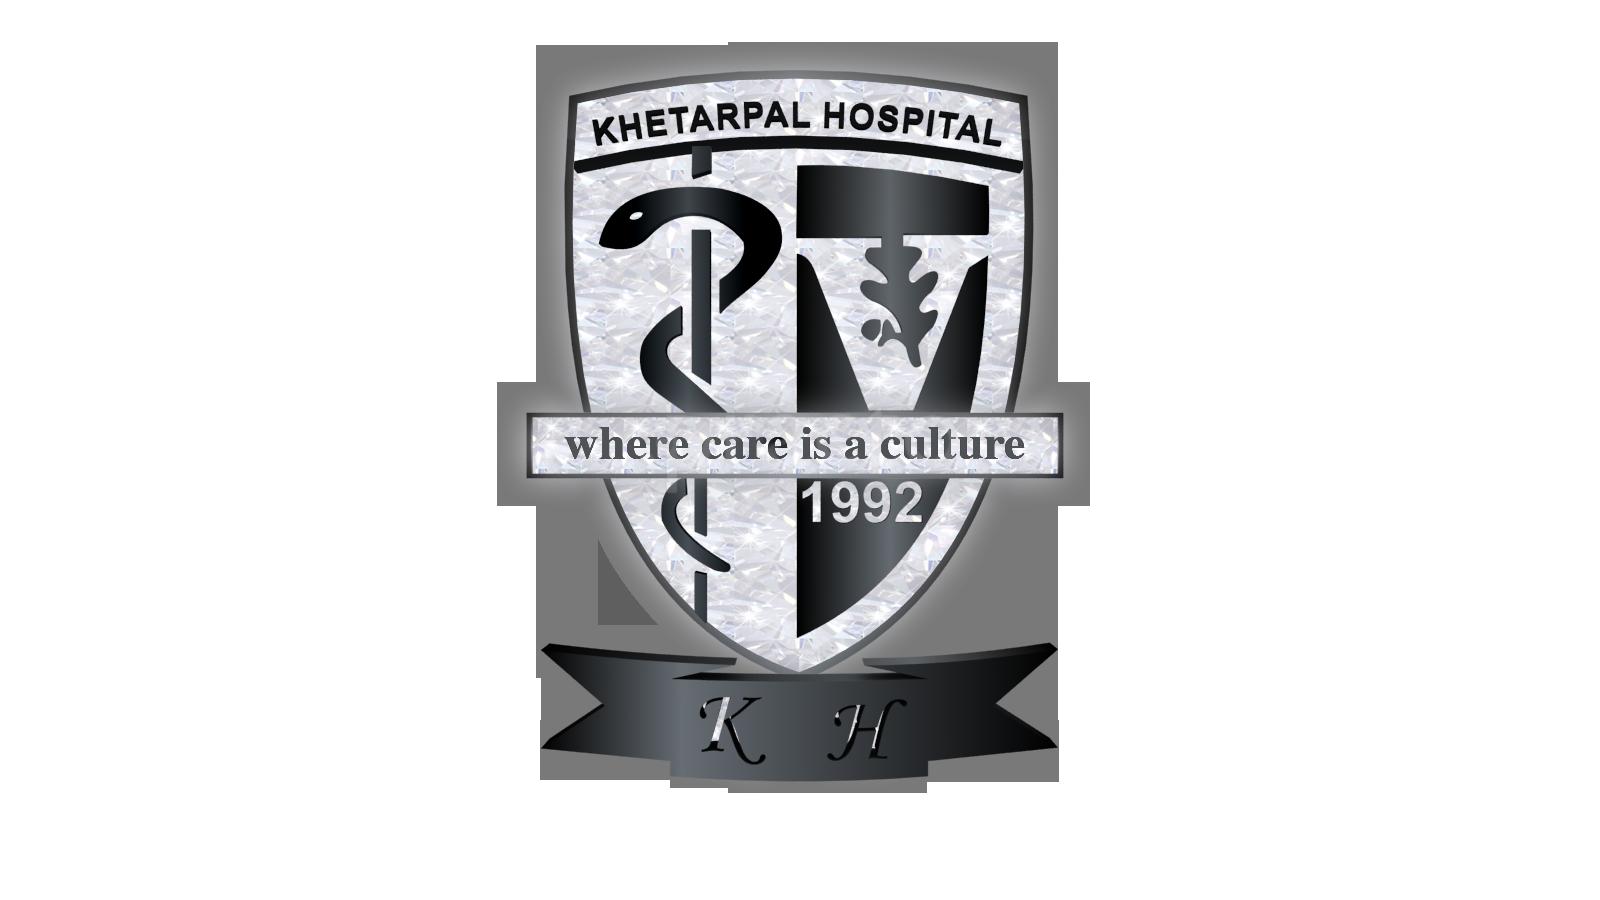 Khetarpal Hospital